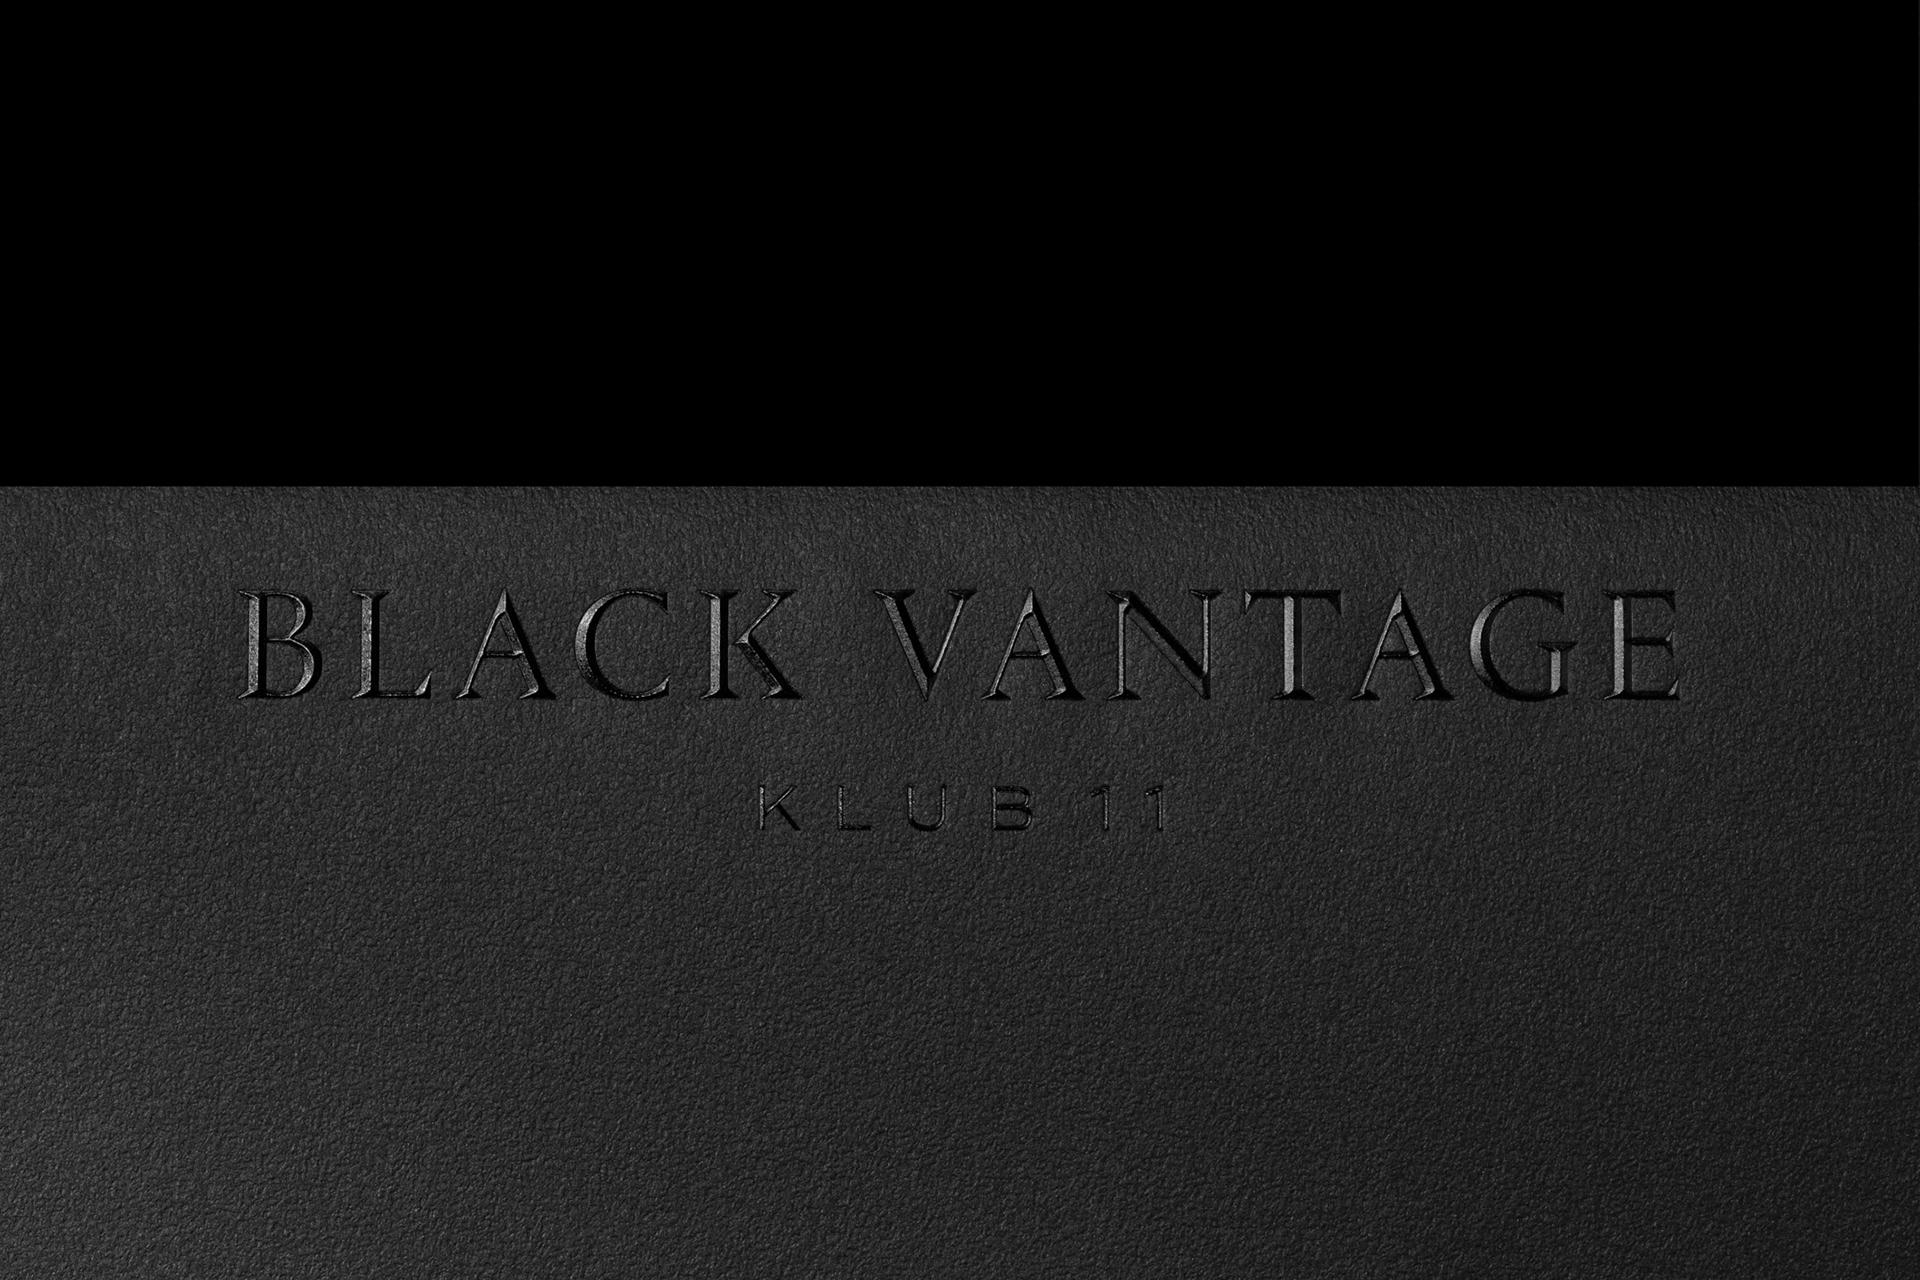 black-vantage_03